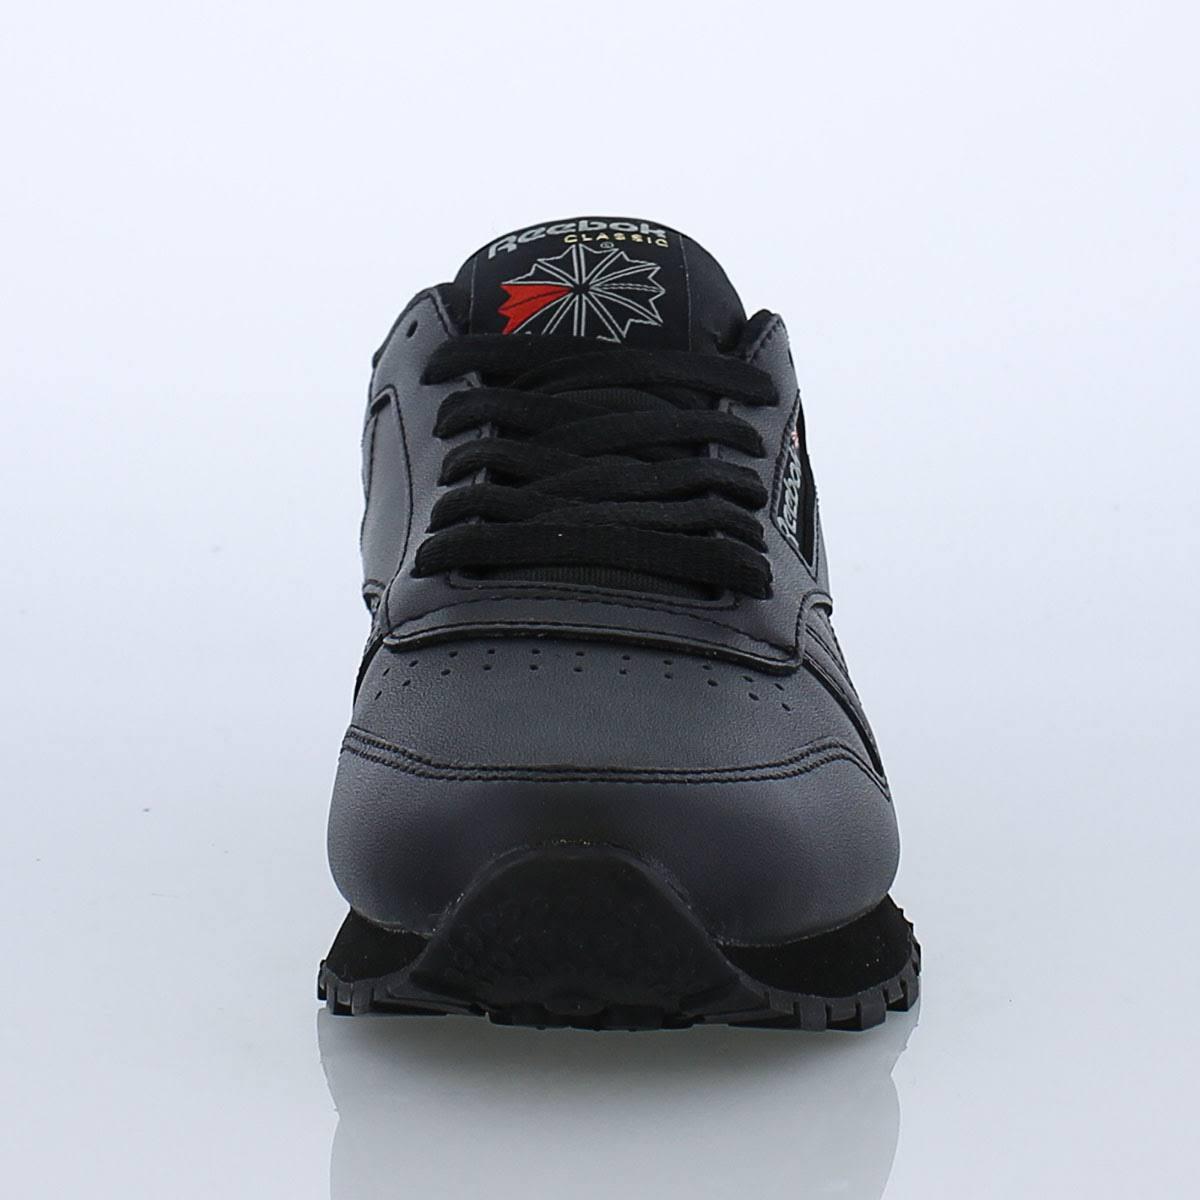 Leather Zapatos 9475 Tamaño De Classic Reebok 9 Negro Mujer 4wn5UxCq